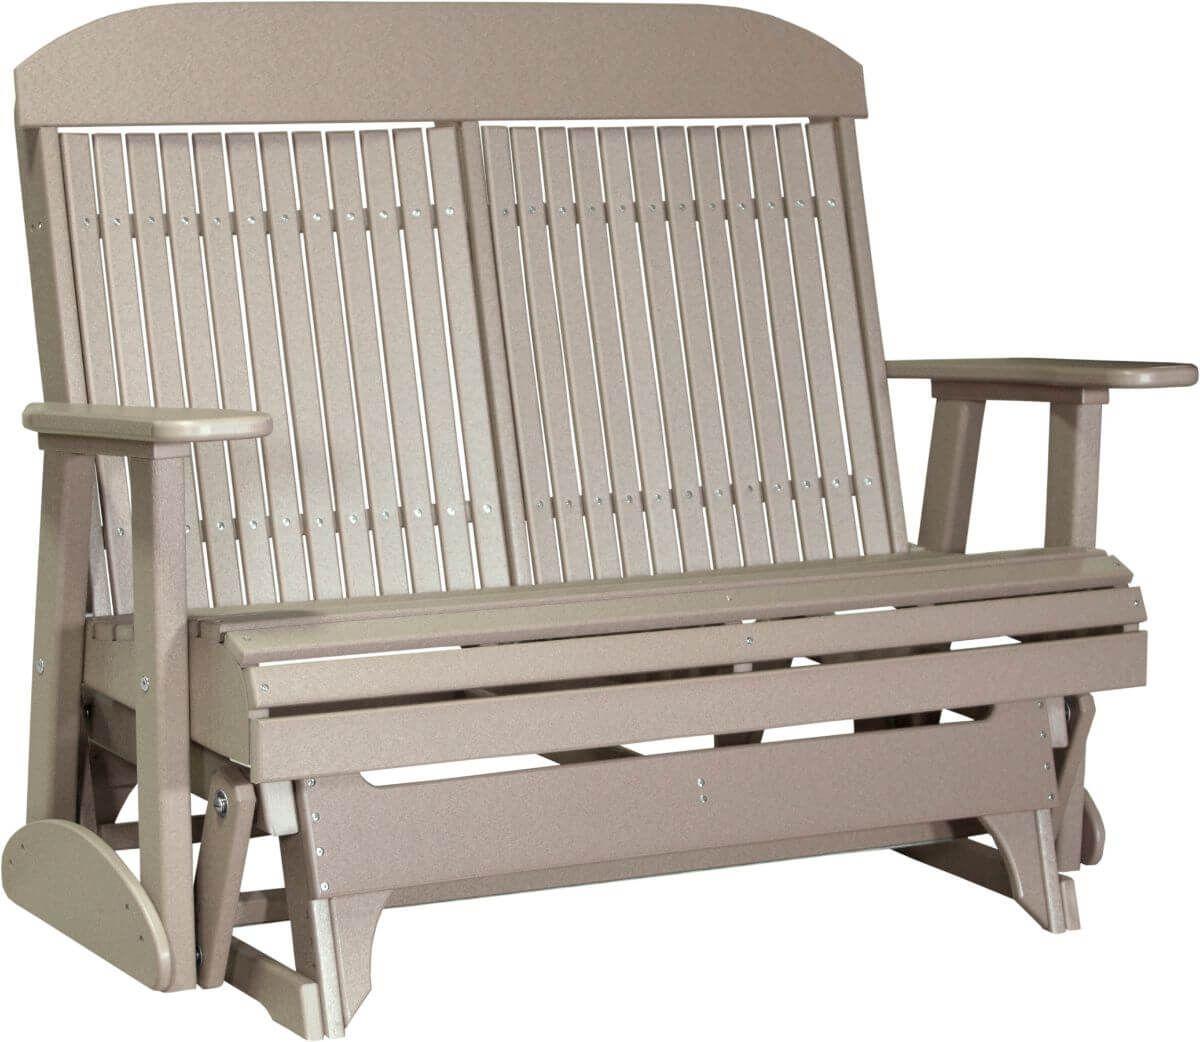 Weatherwood Stockton Outdoor Glider Bench